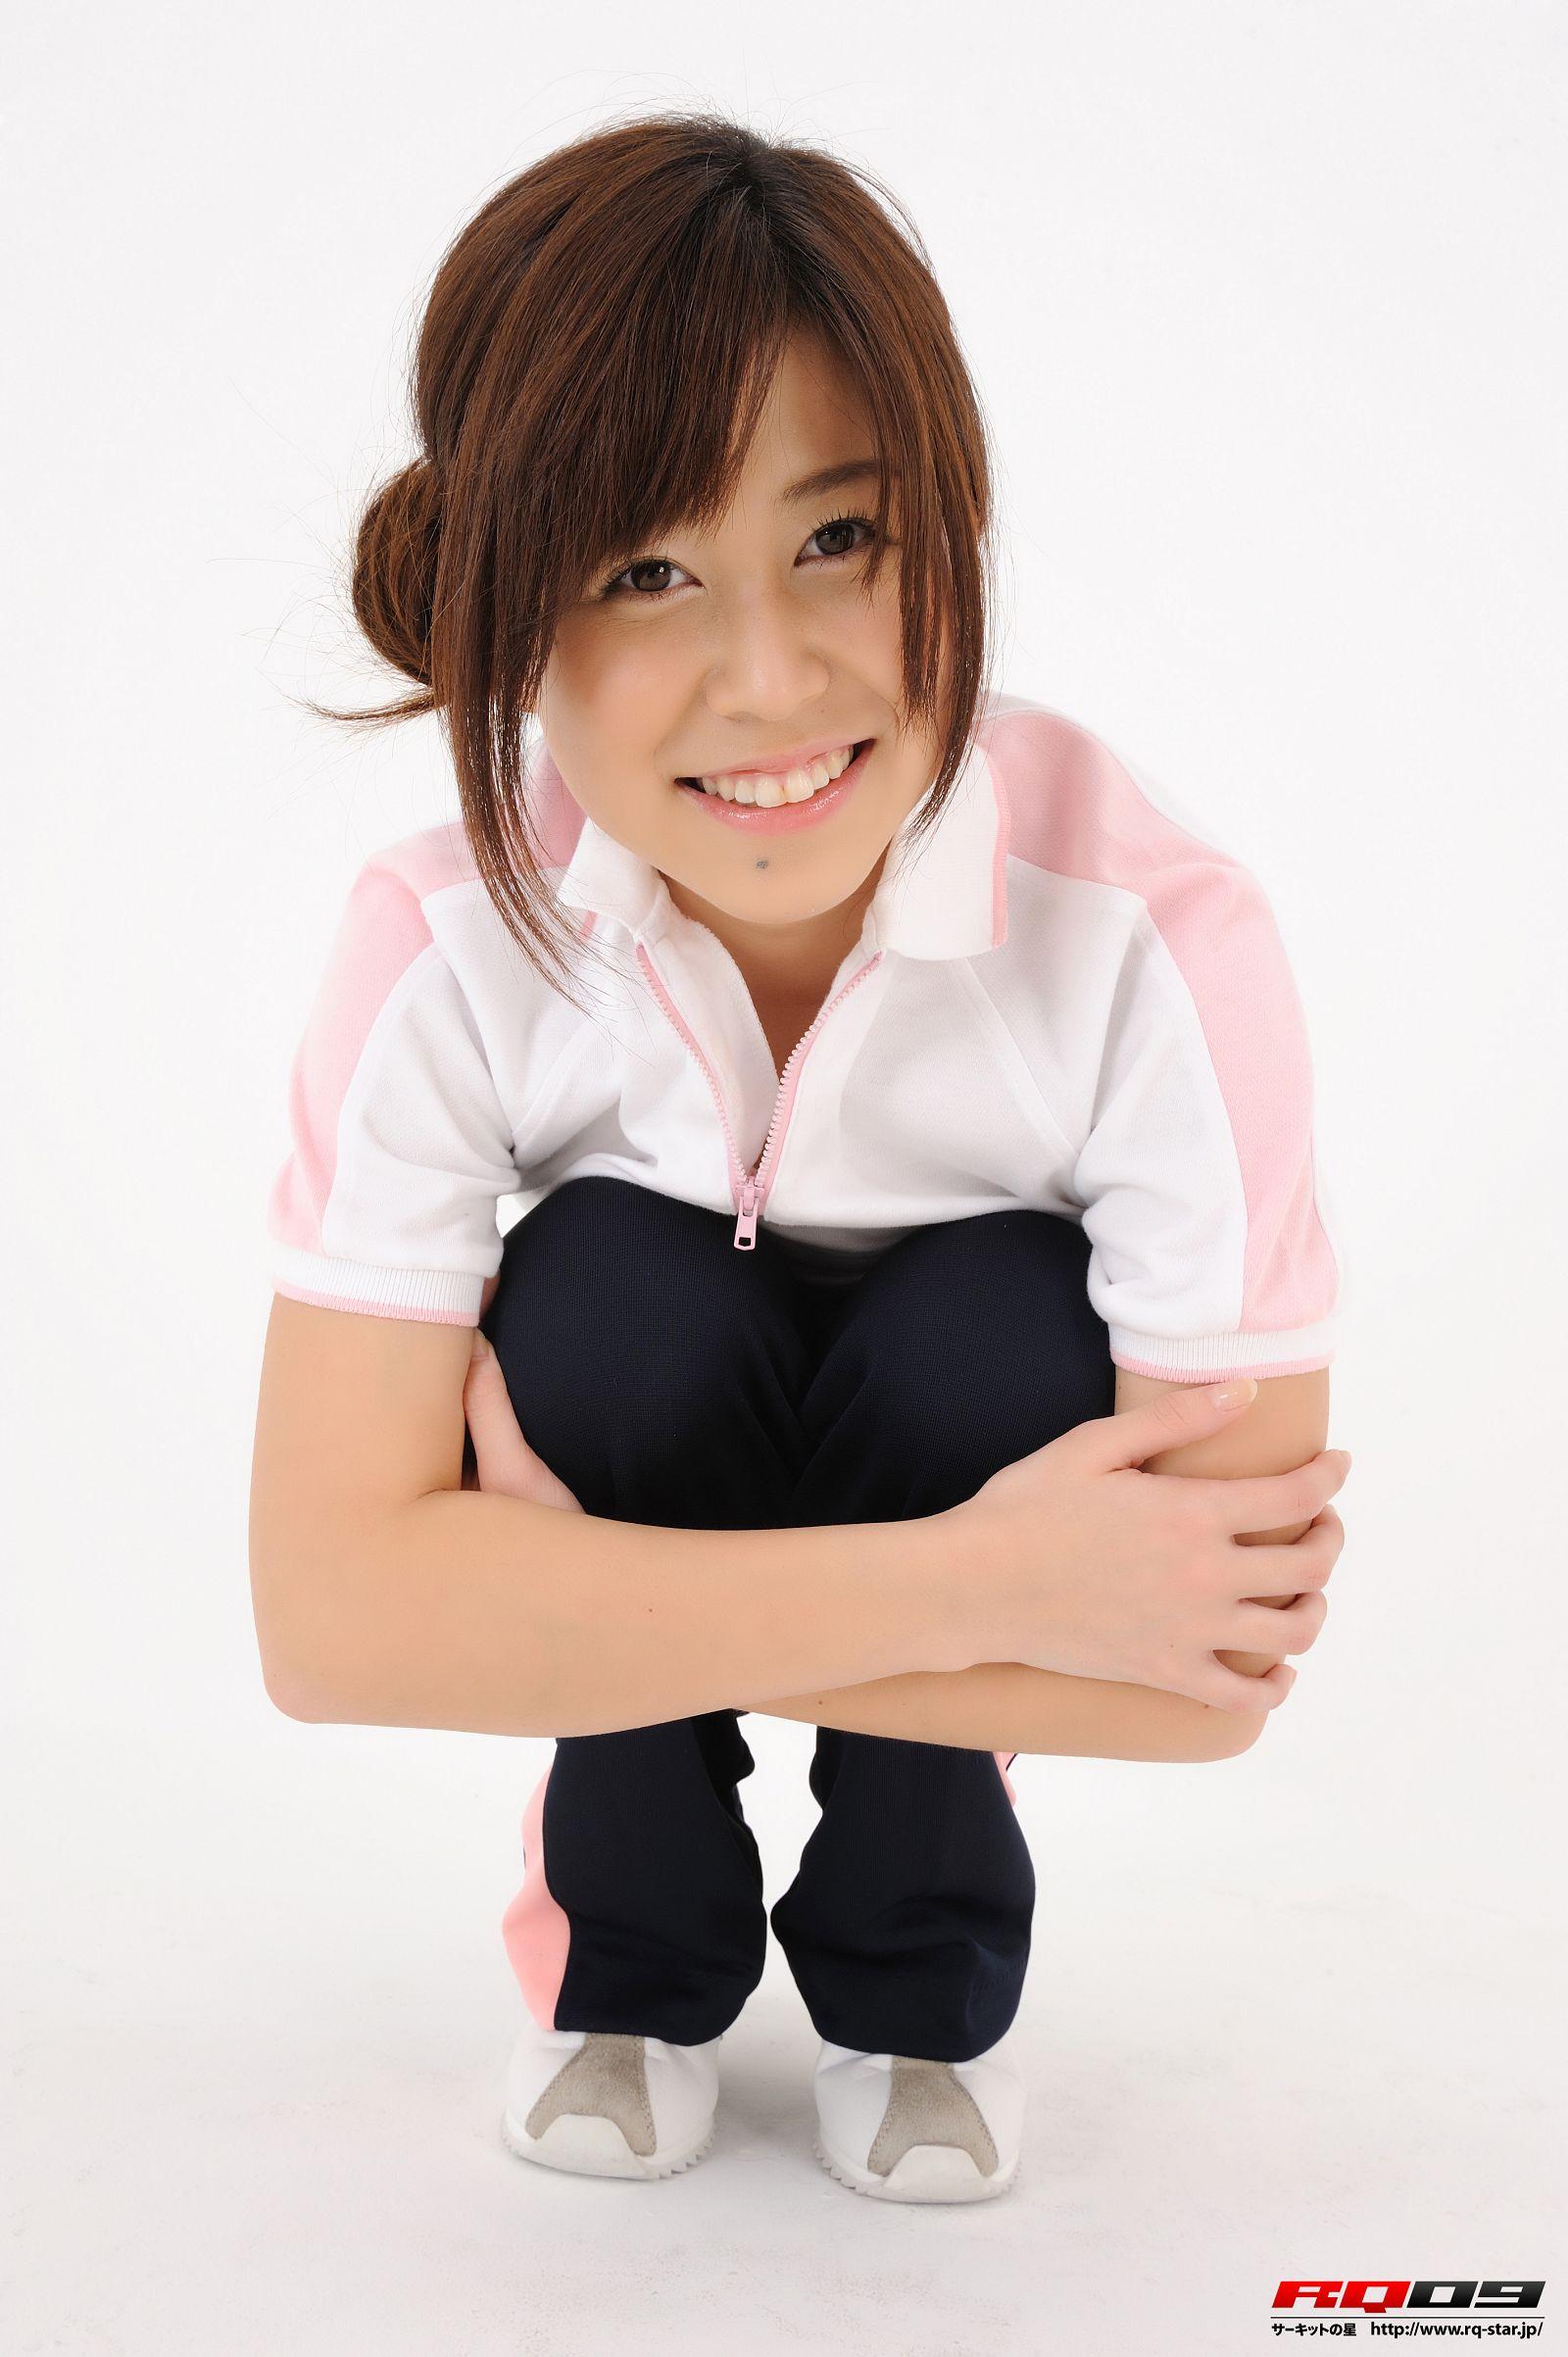 [RQ STAR美女] NO.0133 Airi Nagasaku 永作あいり Kindergartner[50P] RQ STAR 第2张